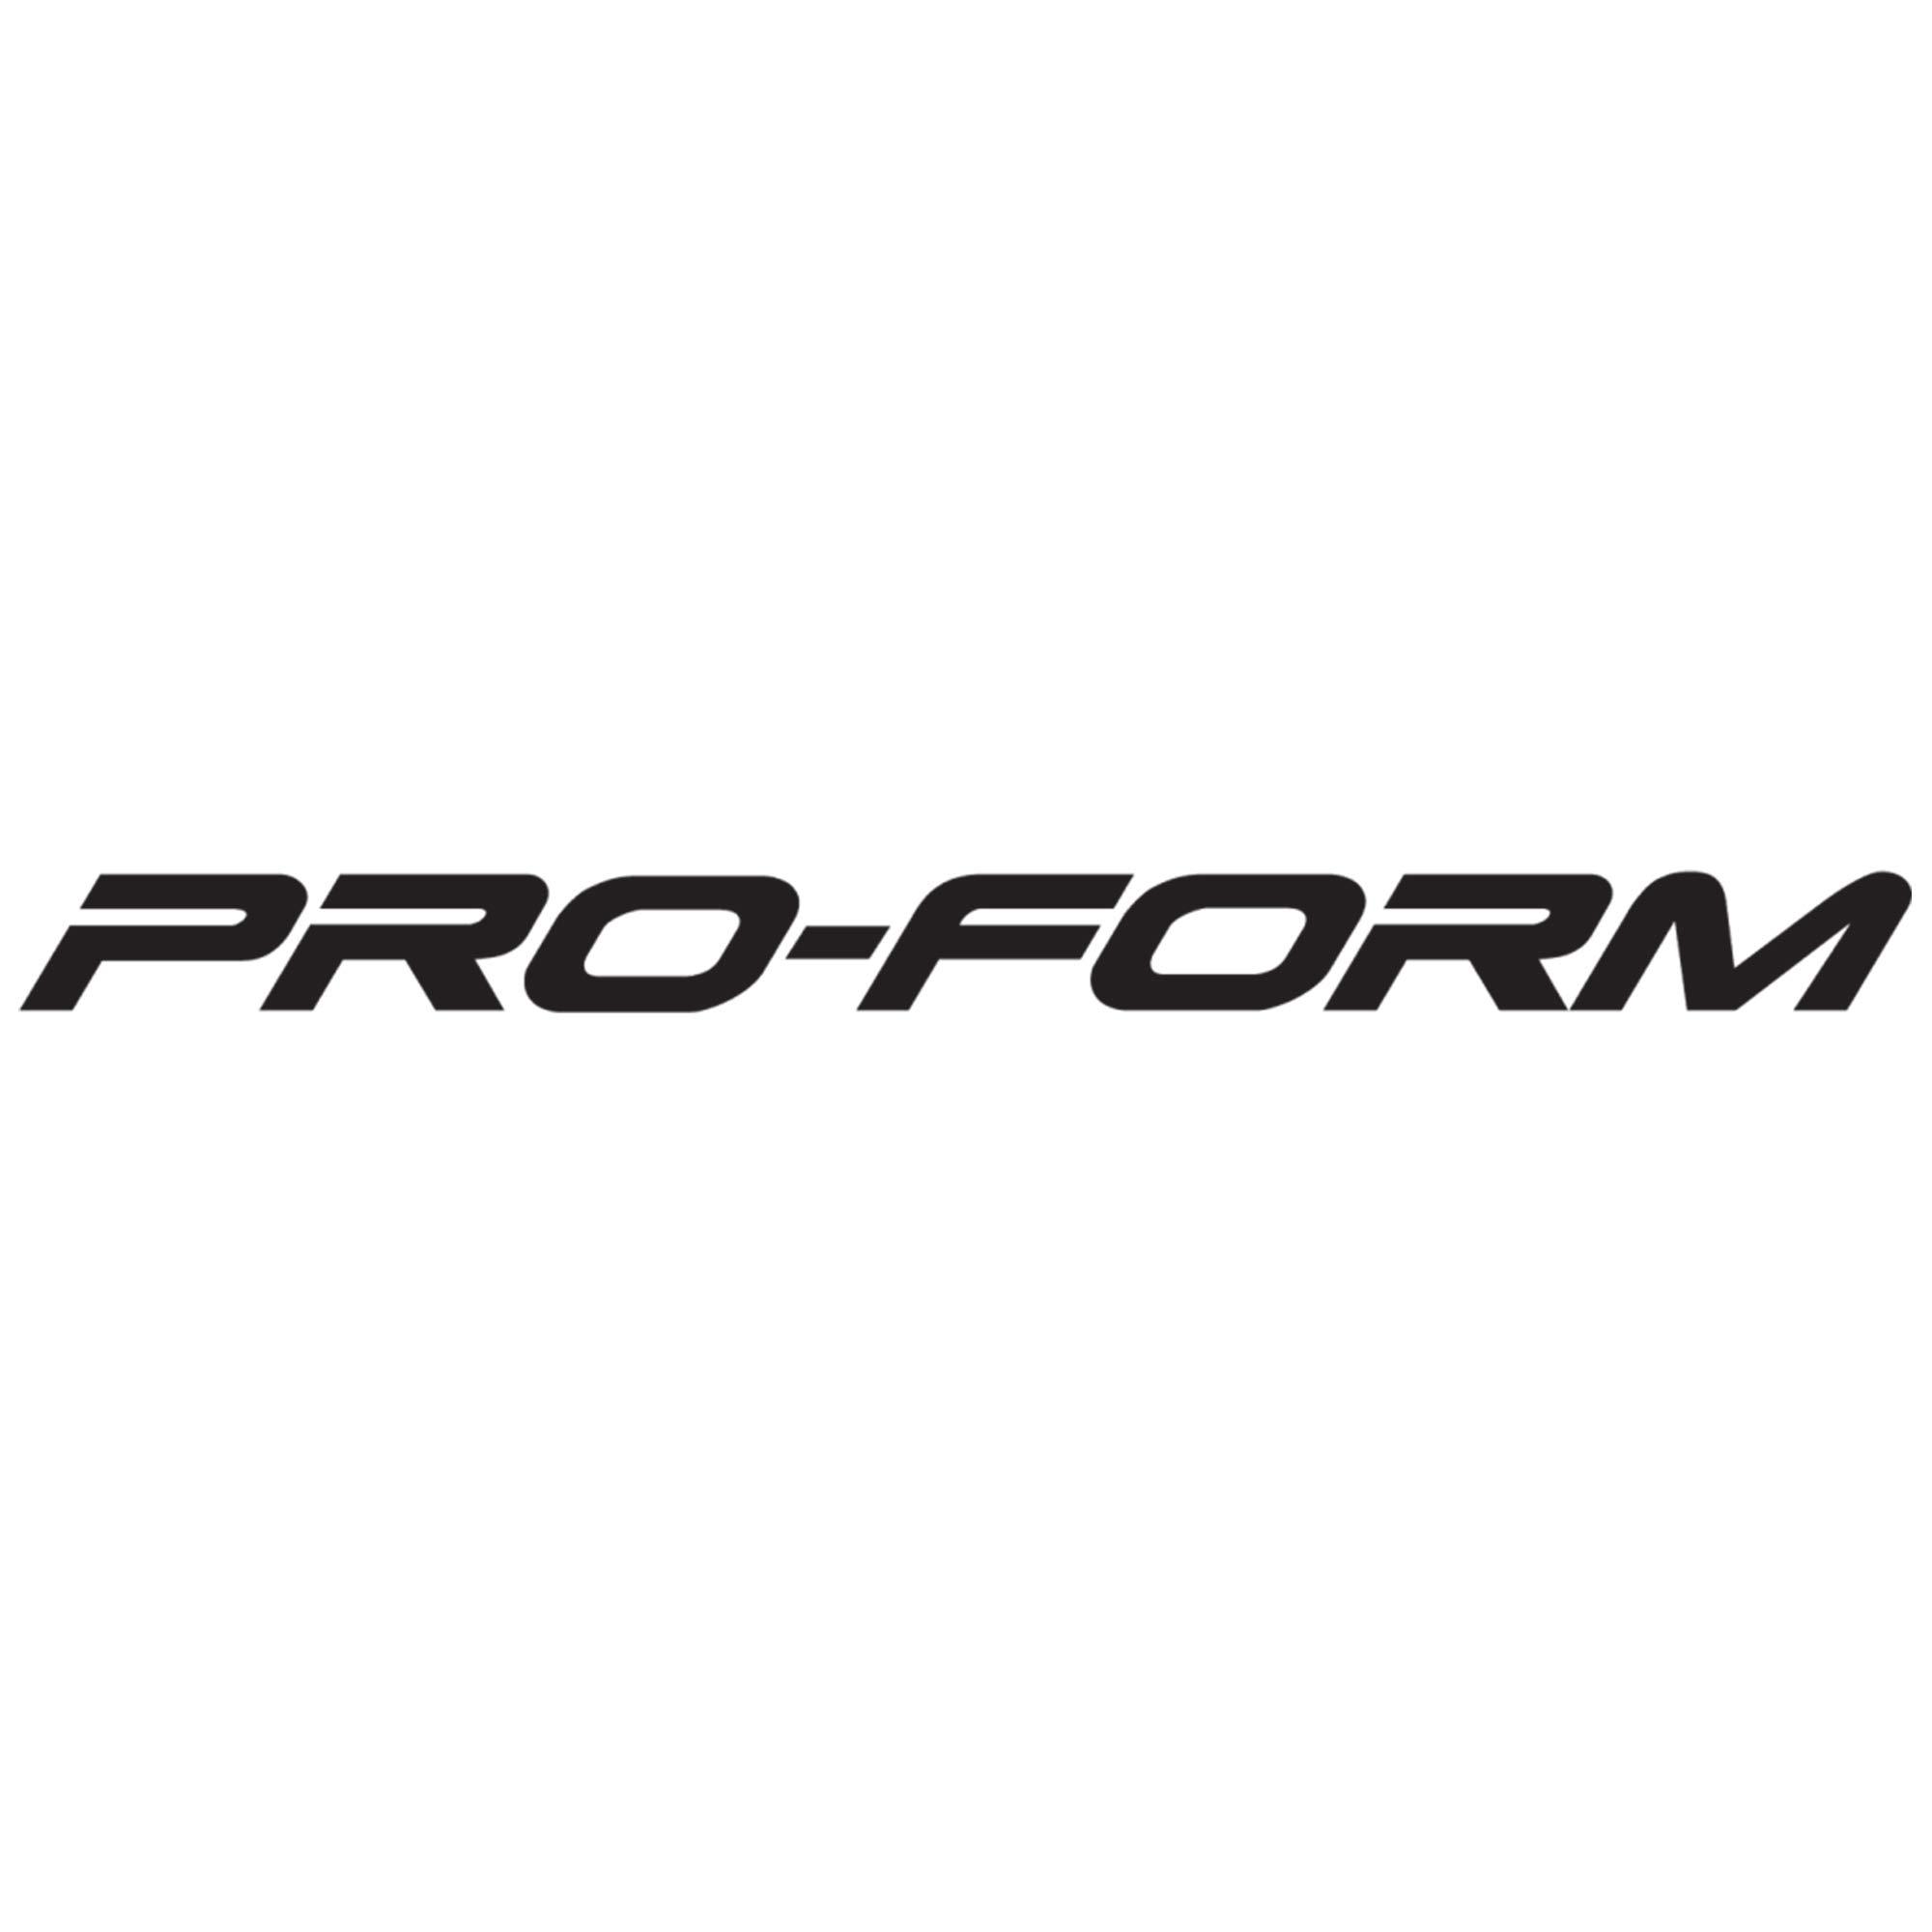 Proform Lifestyler 352733 Axle,Crank,a Genuine Original Equipment Manufacturer (OEM) Part by Proform Lifestyler (Image #4)